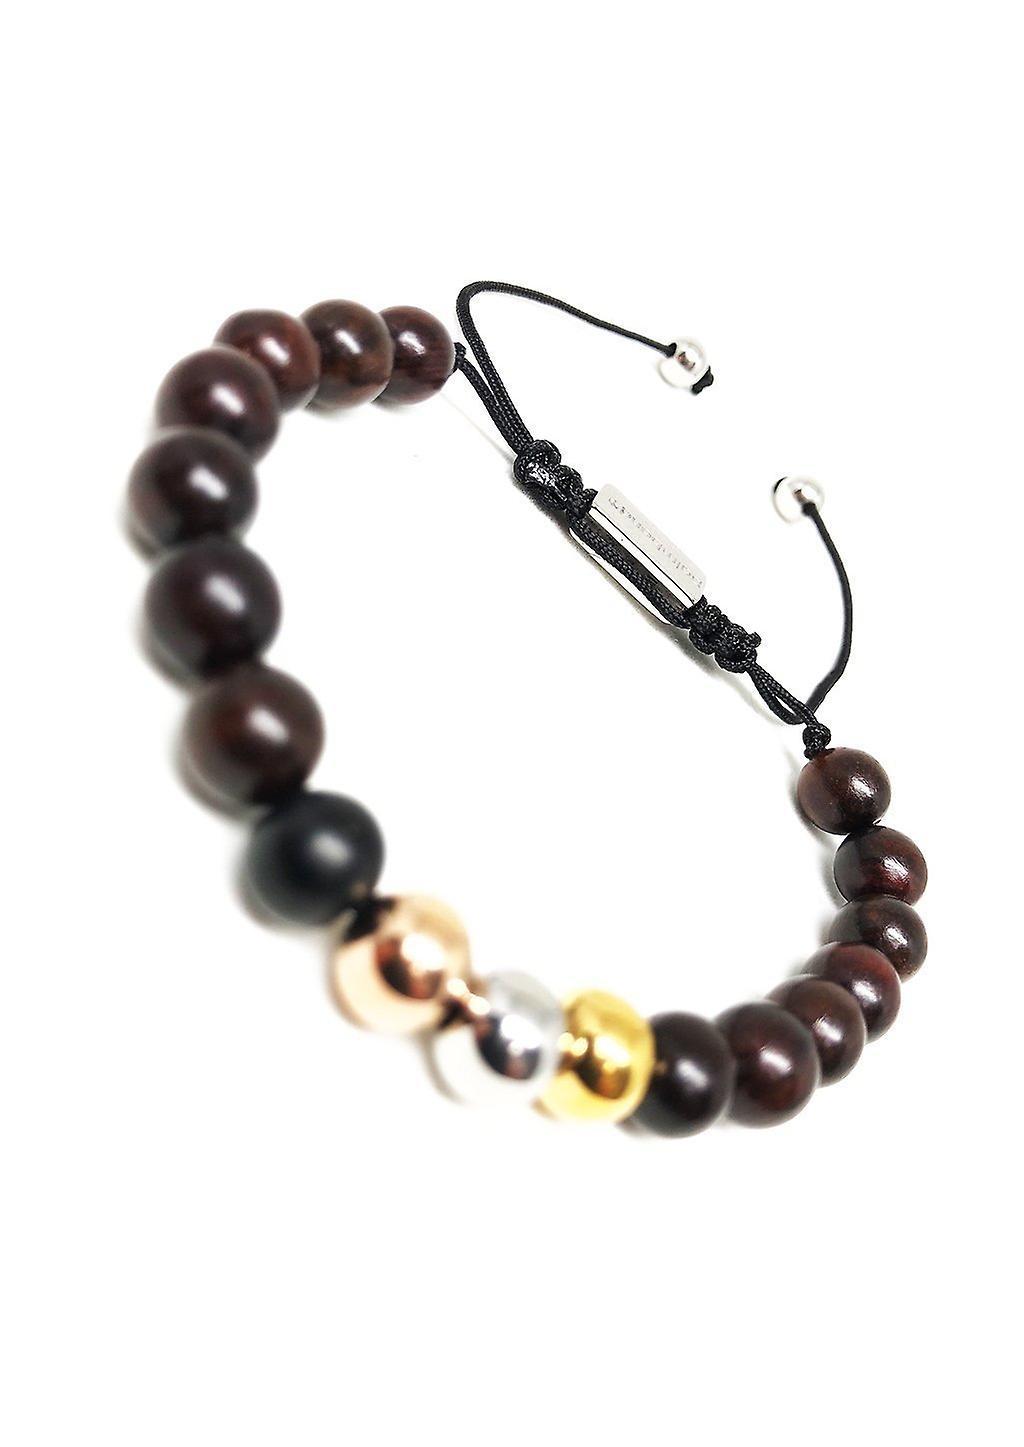 Palm Band - Bead Bracelet